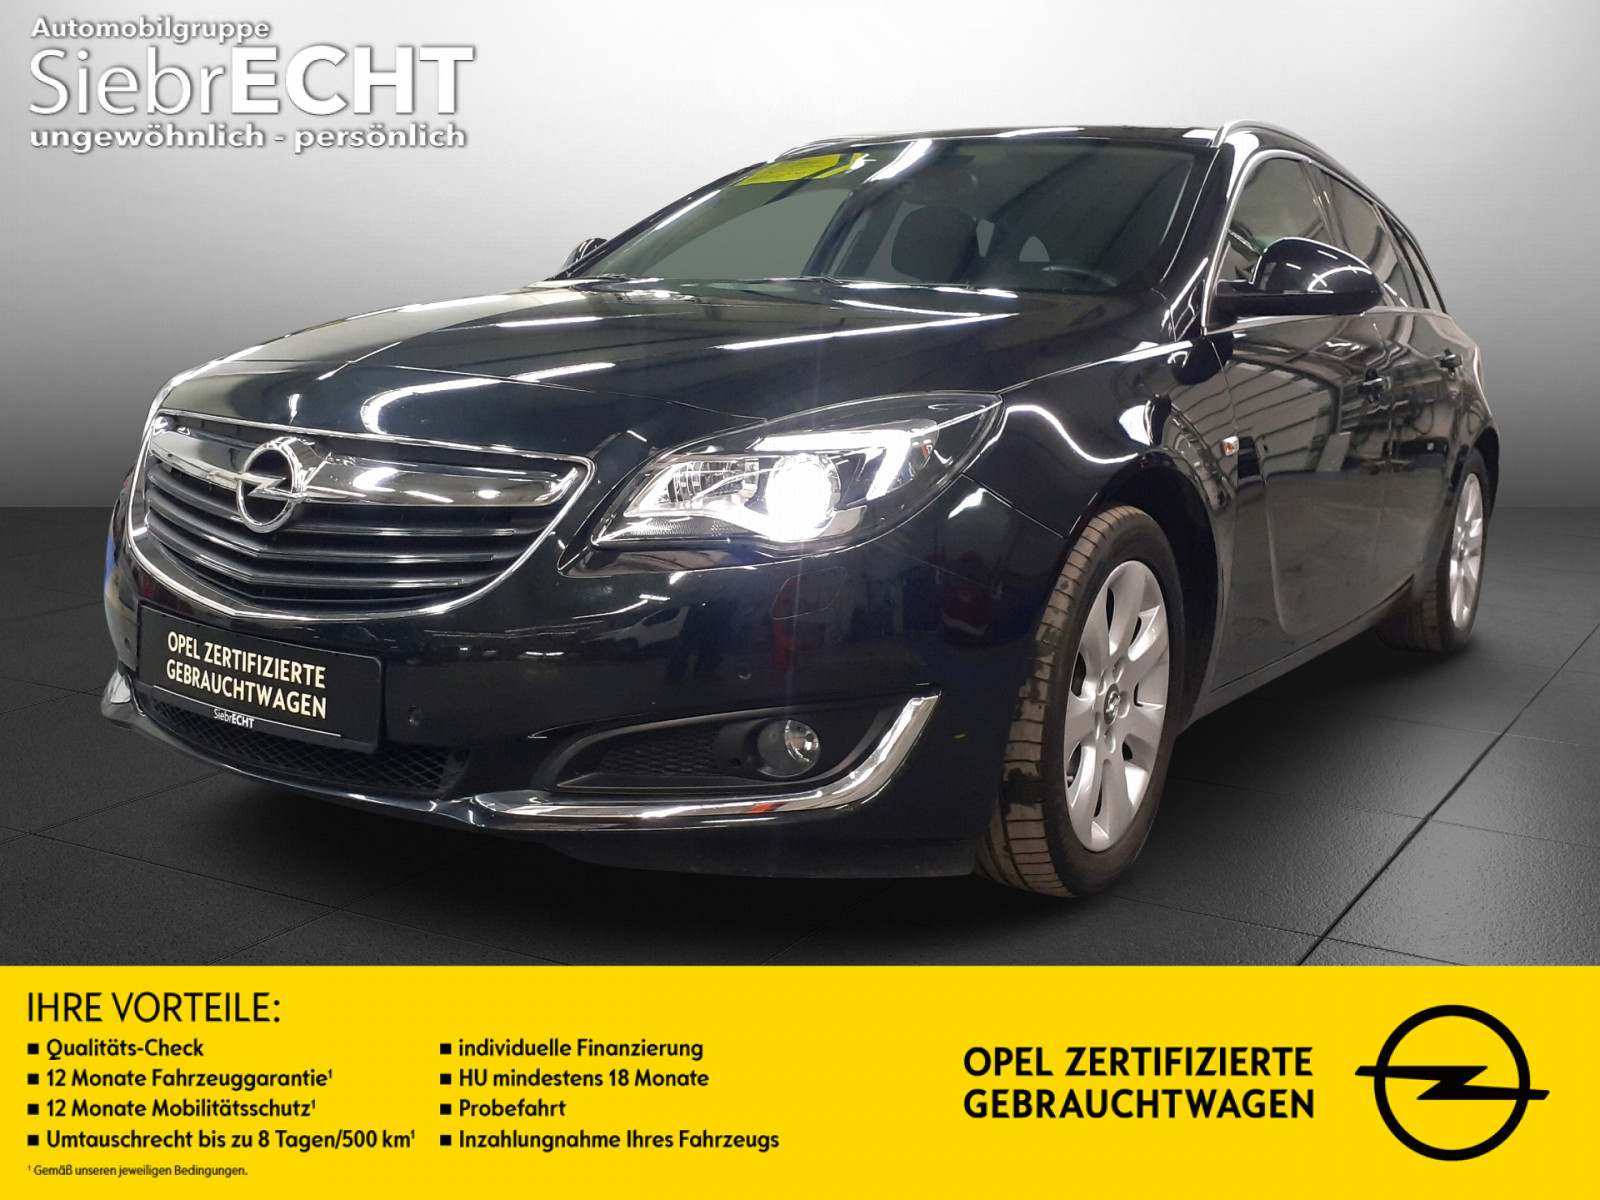 Opel Insignia Innovation 1.6 D*Xenon*Navi*RFK*PDC*AHK, Jahr 2015, Diesel